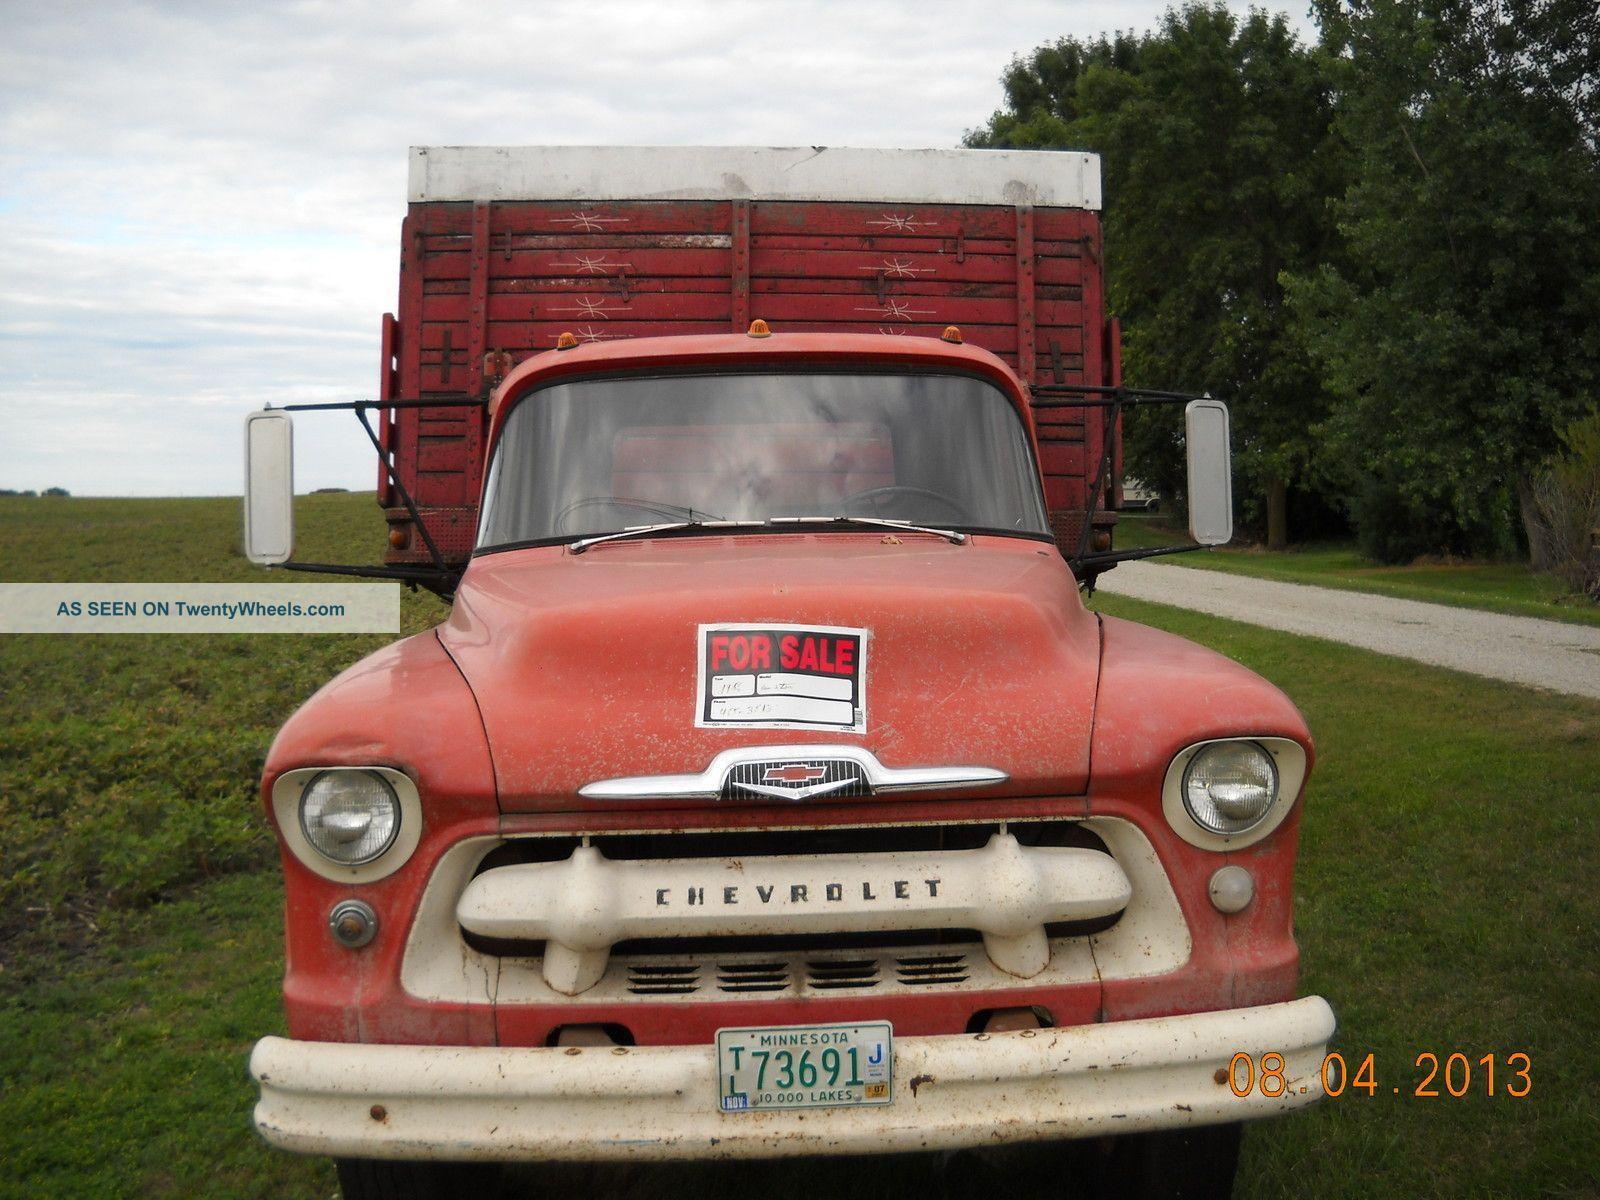 1956 Chevrolet Chevy 6400 Chevy Trucks Chevrolet Chevrolet Trucks